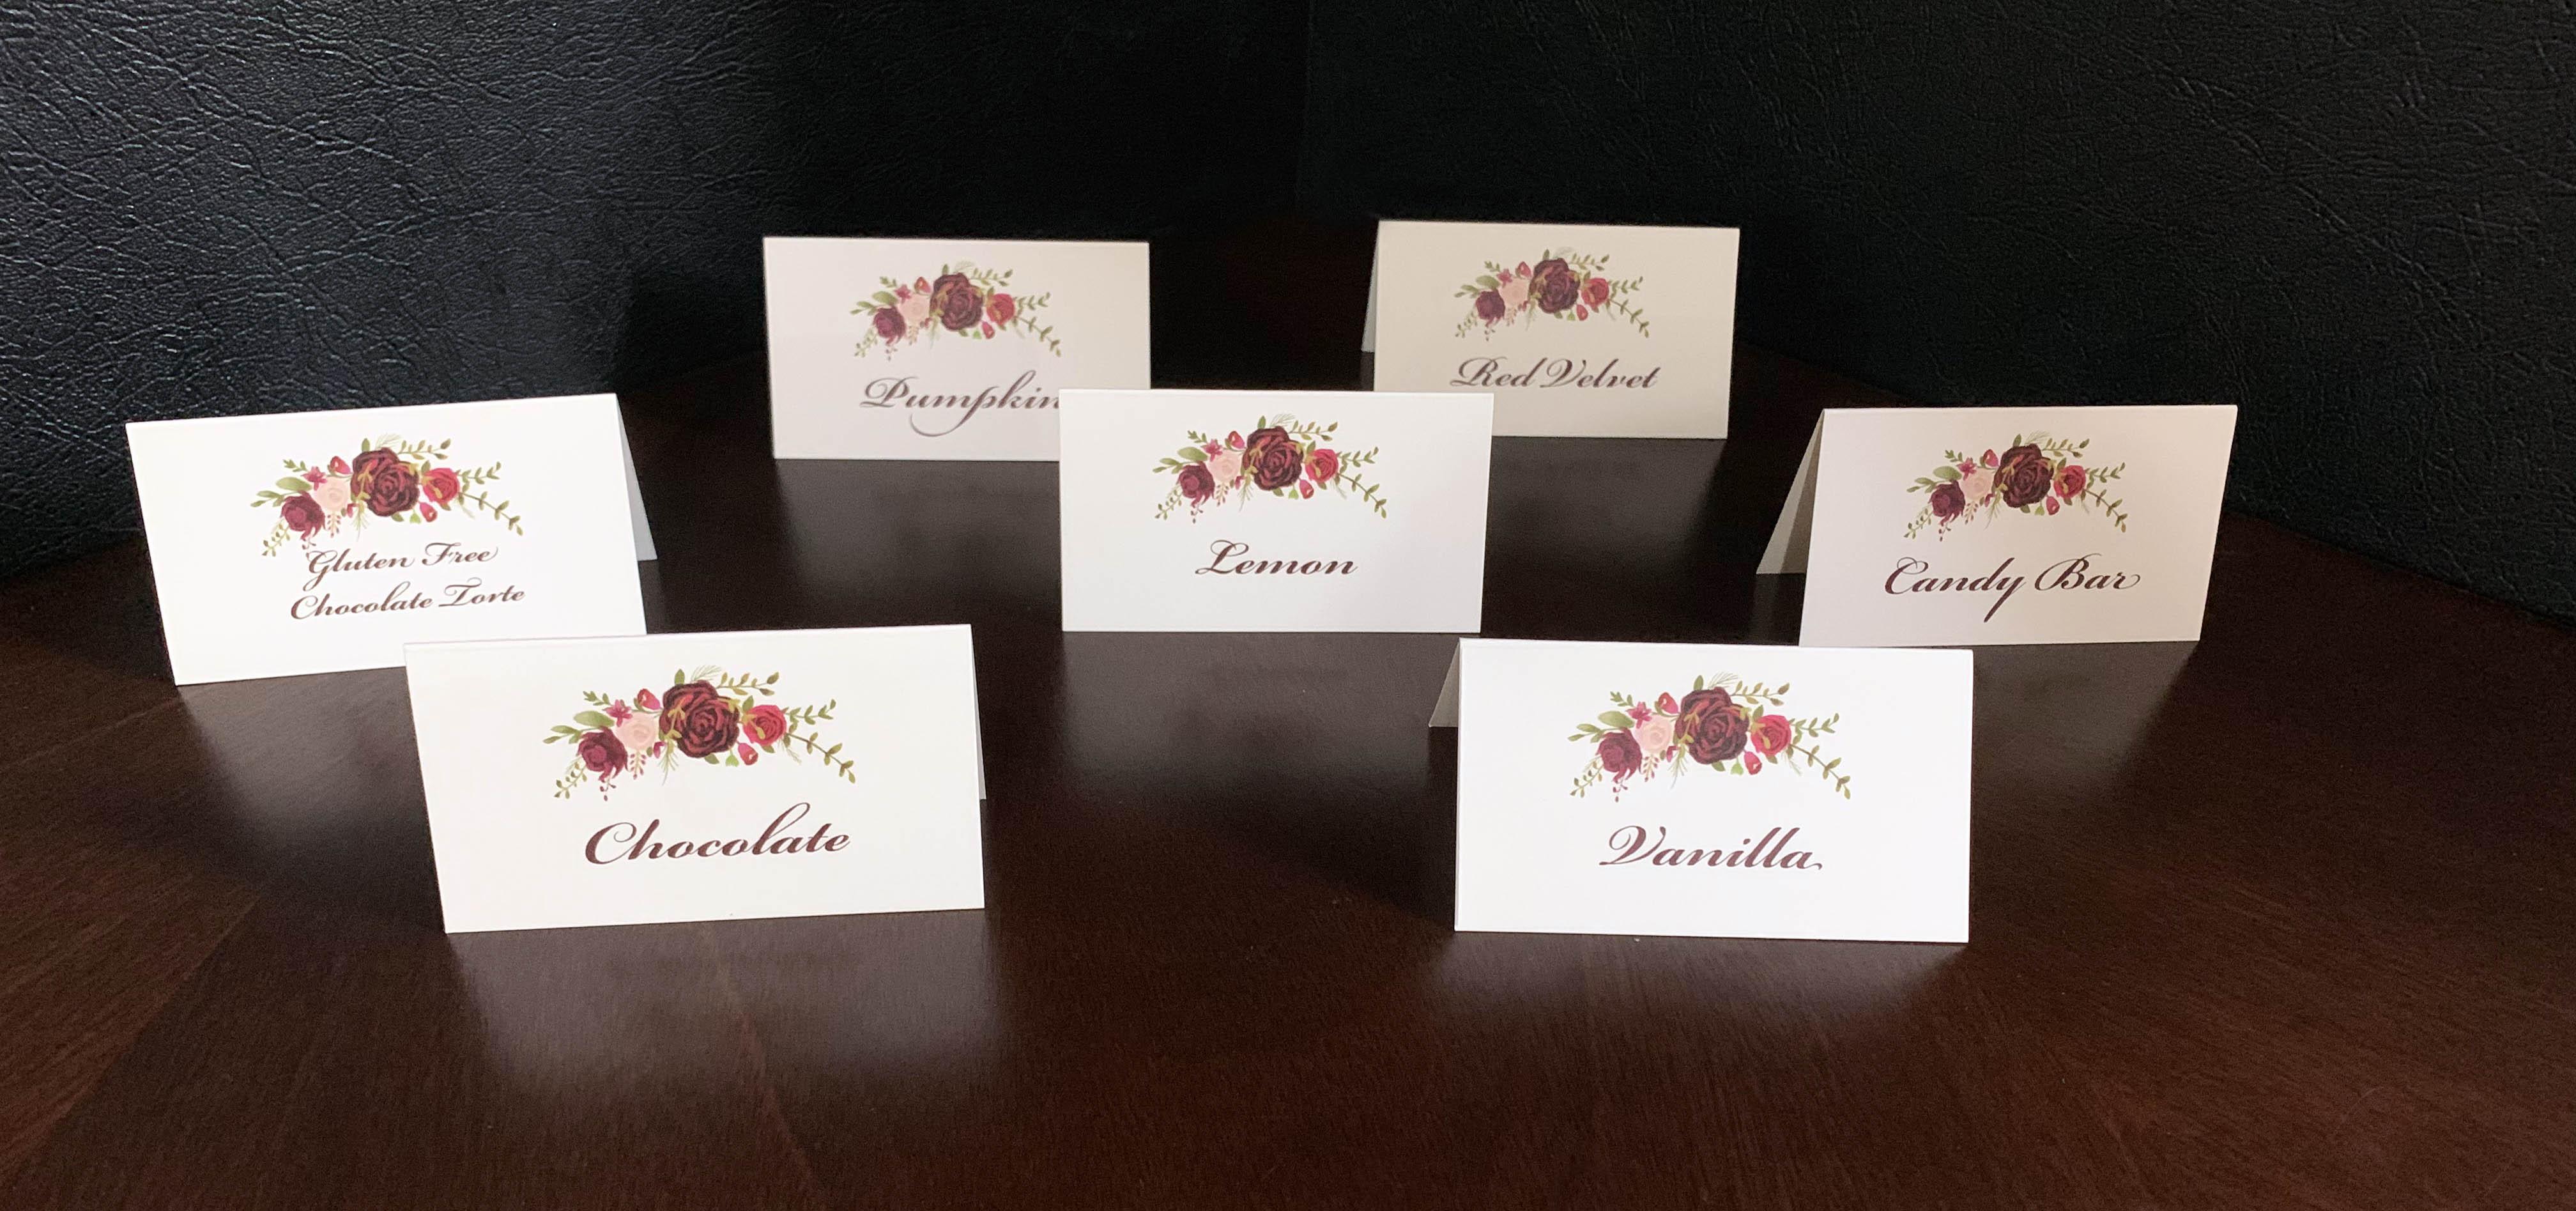 Cupcake Flavor Place Cards